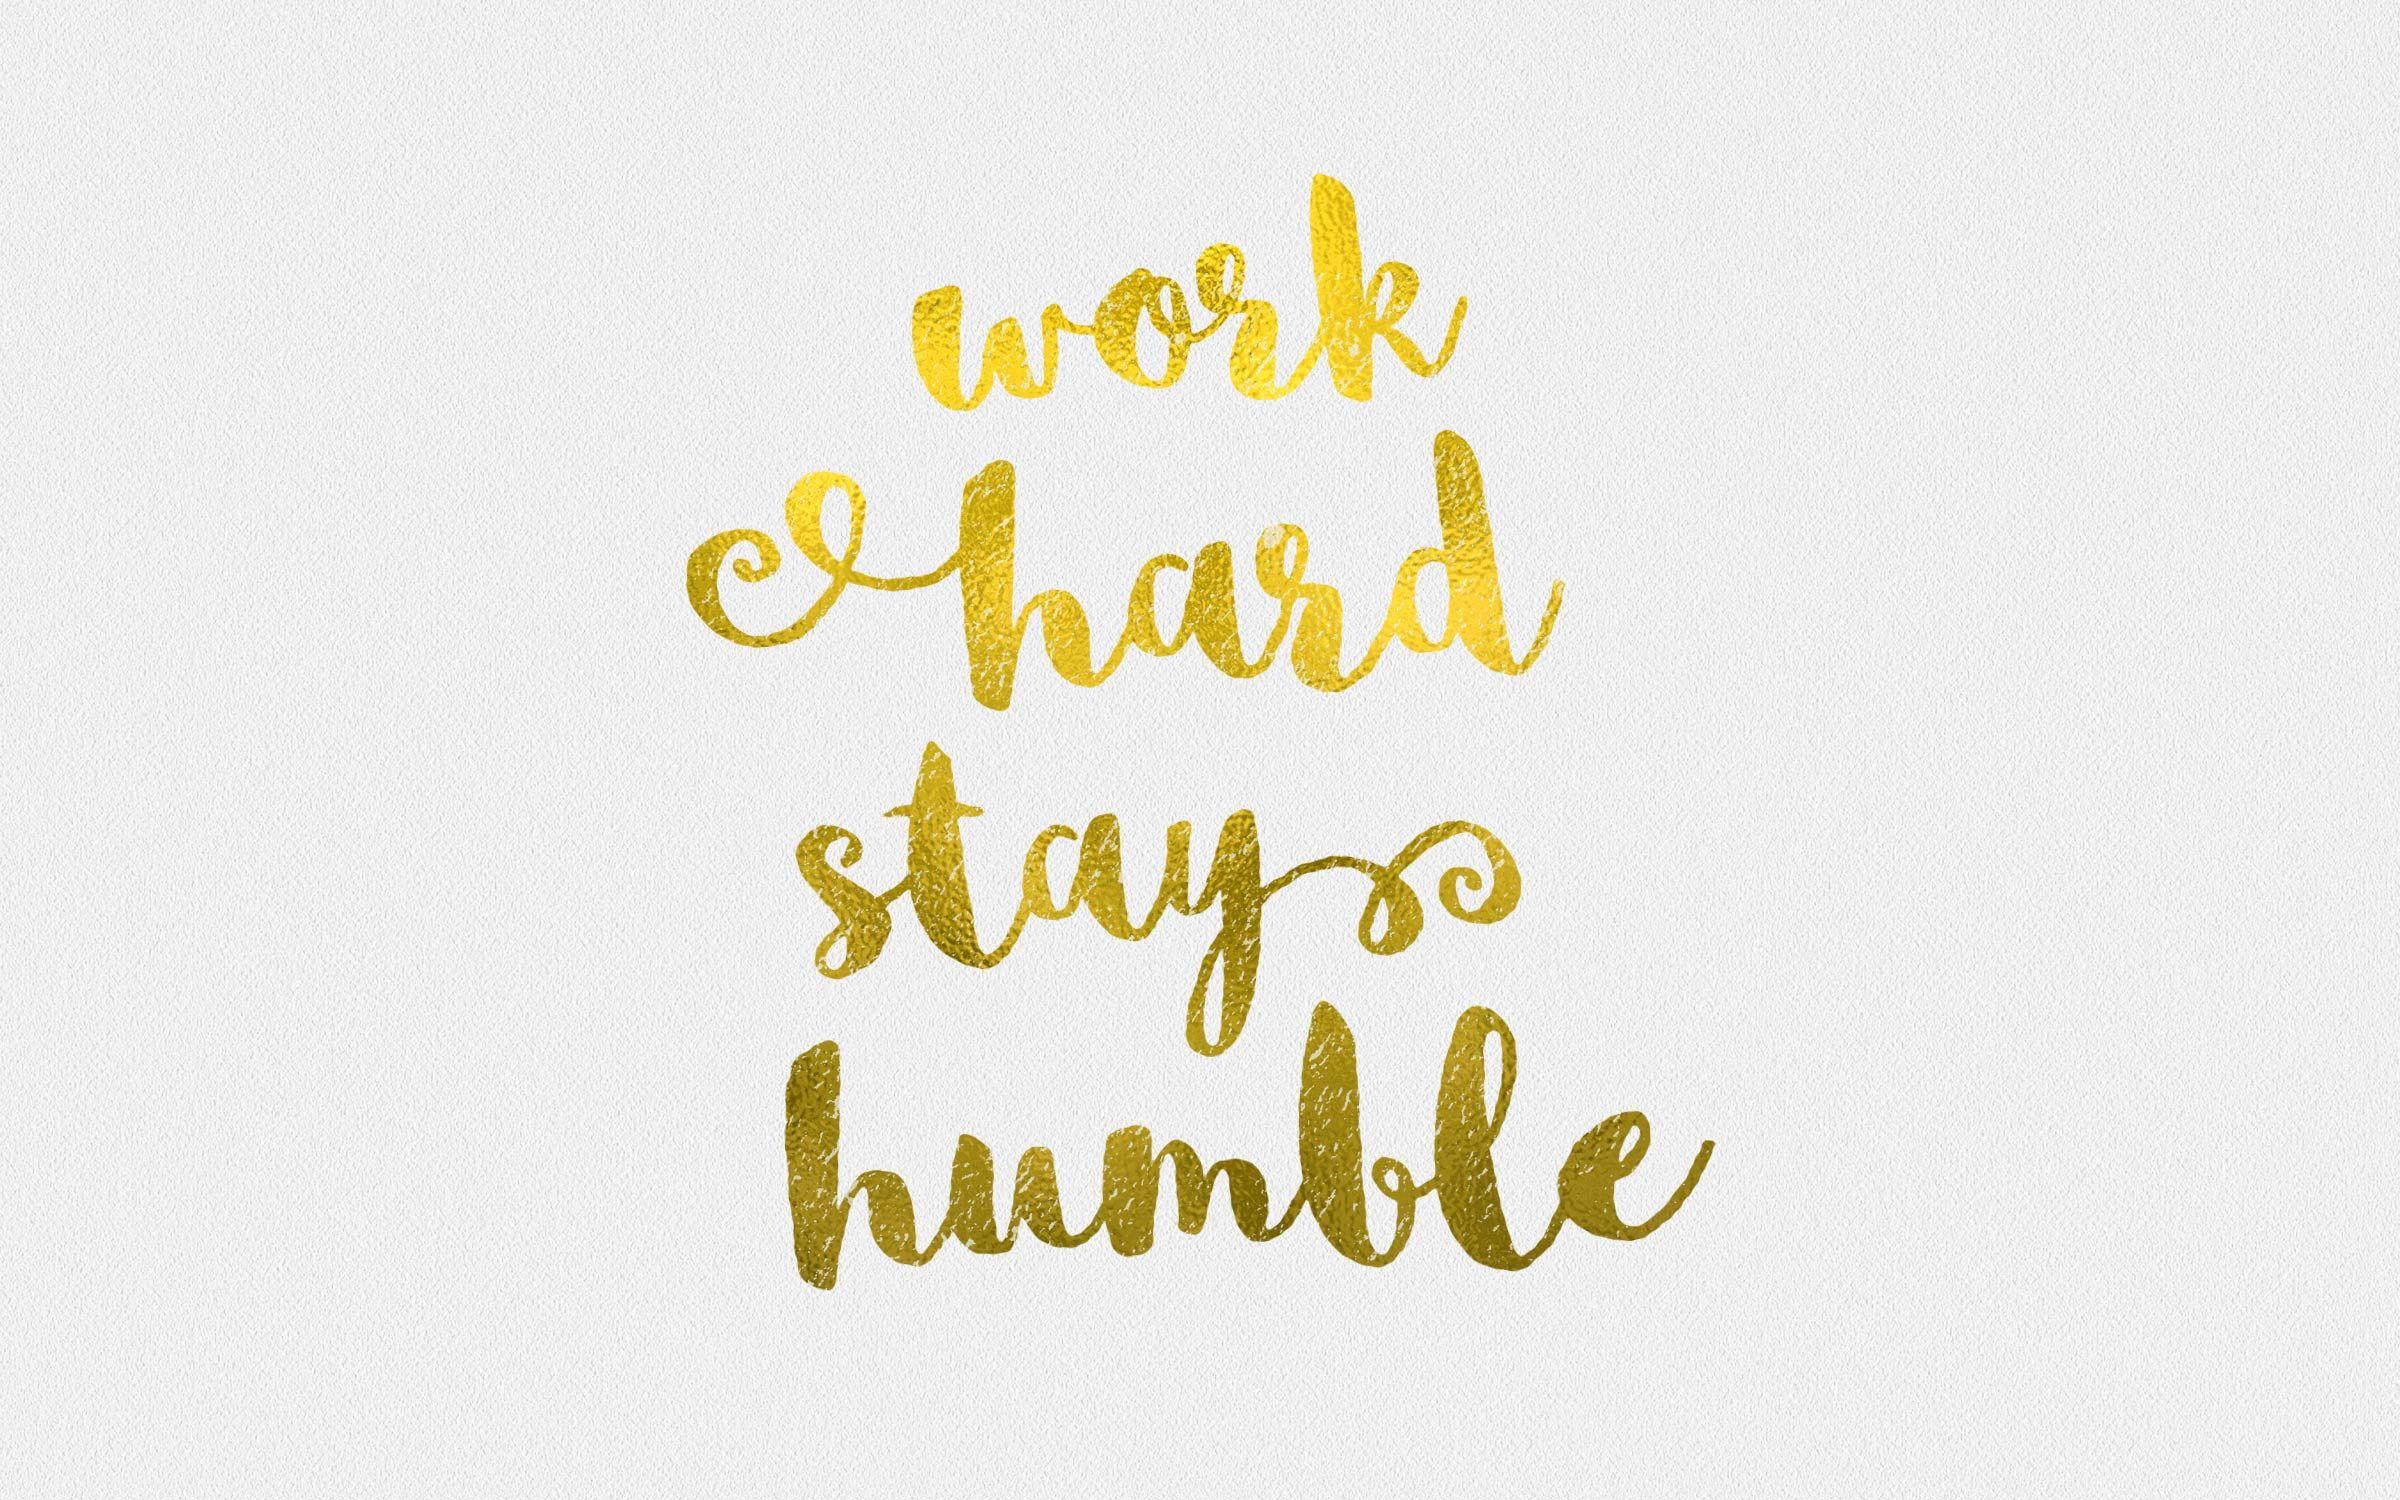 Work Hard Stay Humble Desktop Jpg 2400 1500 Cute Wallpaper For Phone Wallpaper Iphone Quotes Wallpaper Quotes